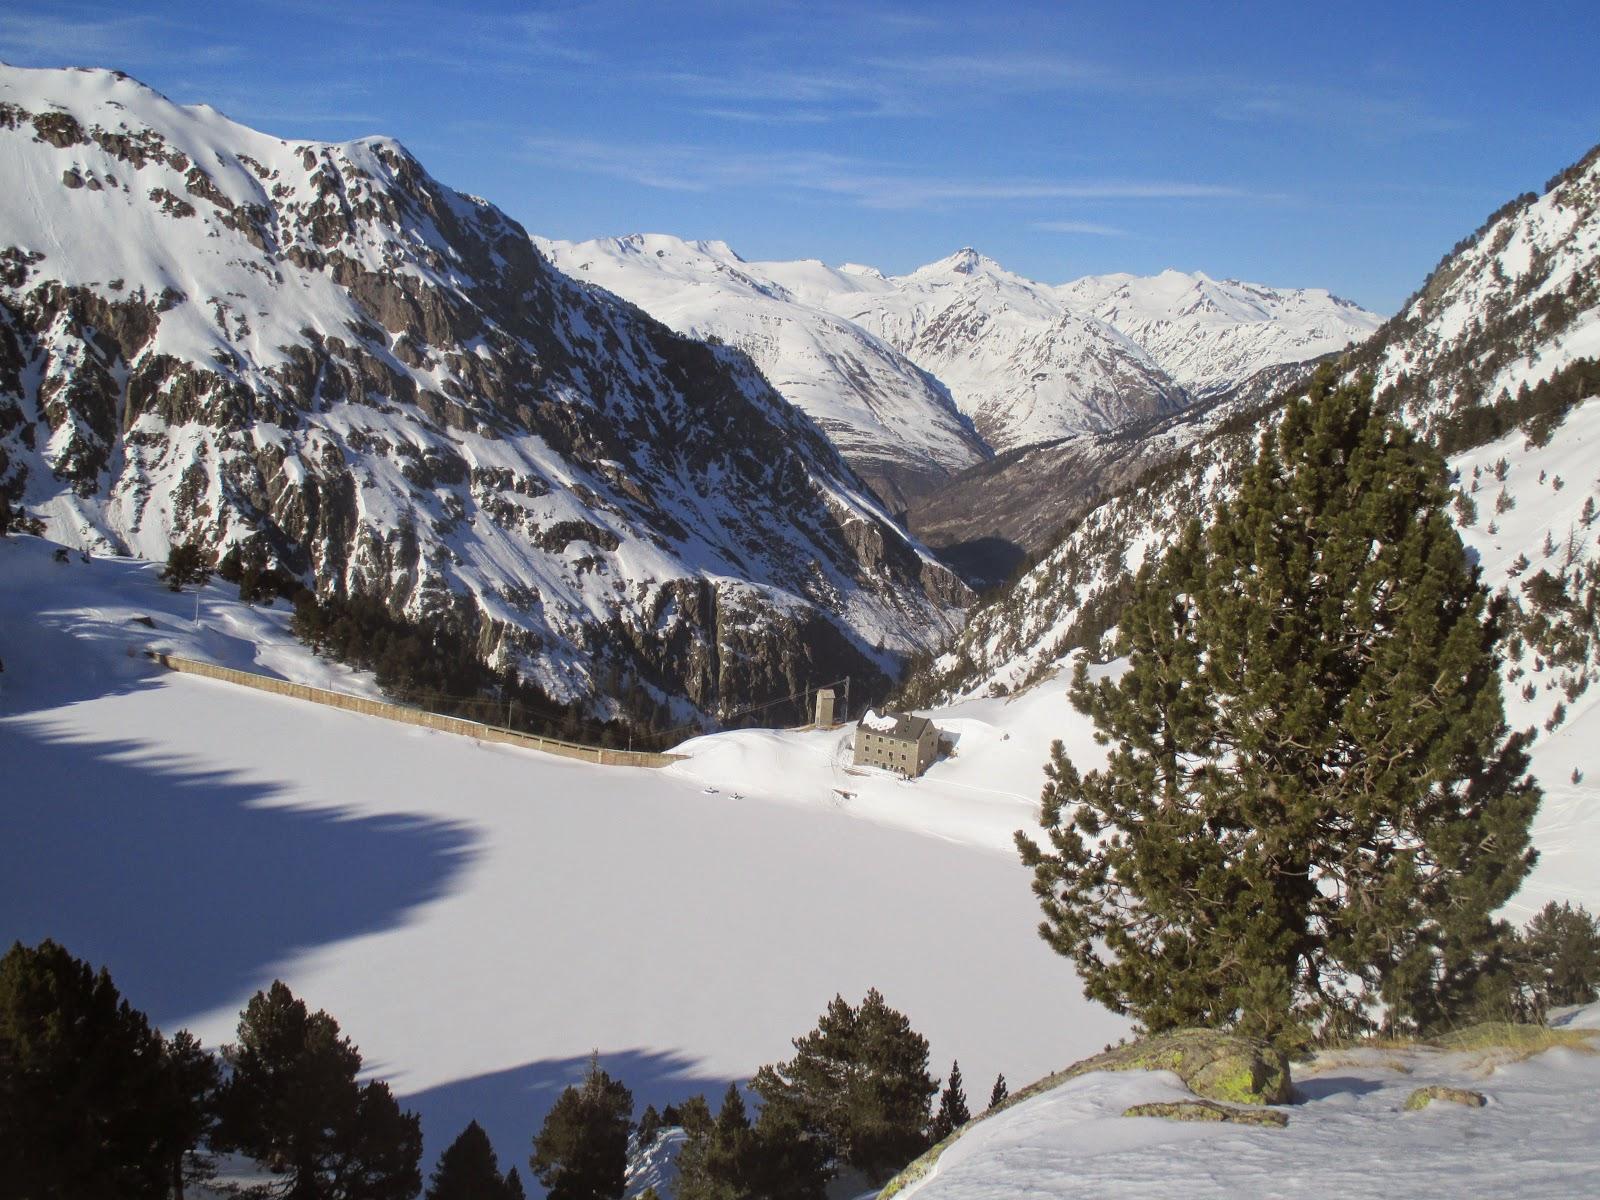 Aiguestortes and San Mauricio National Park 4-day ski tour